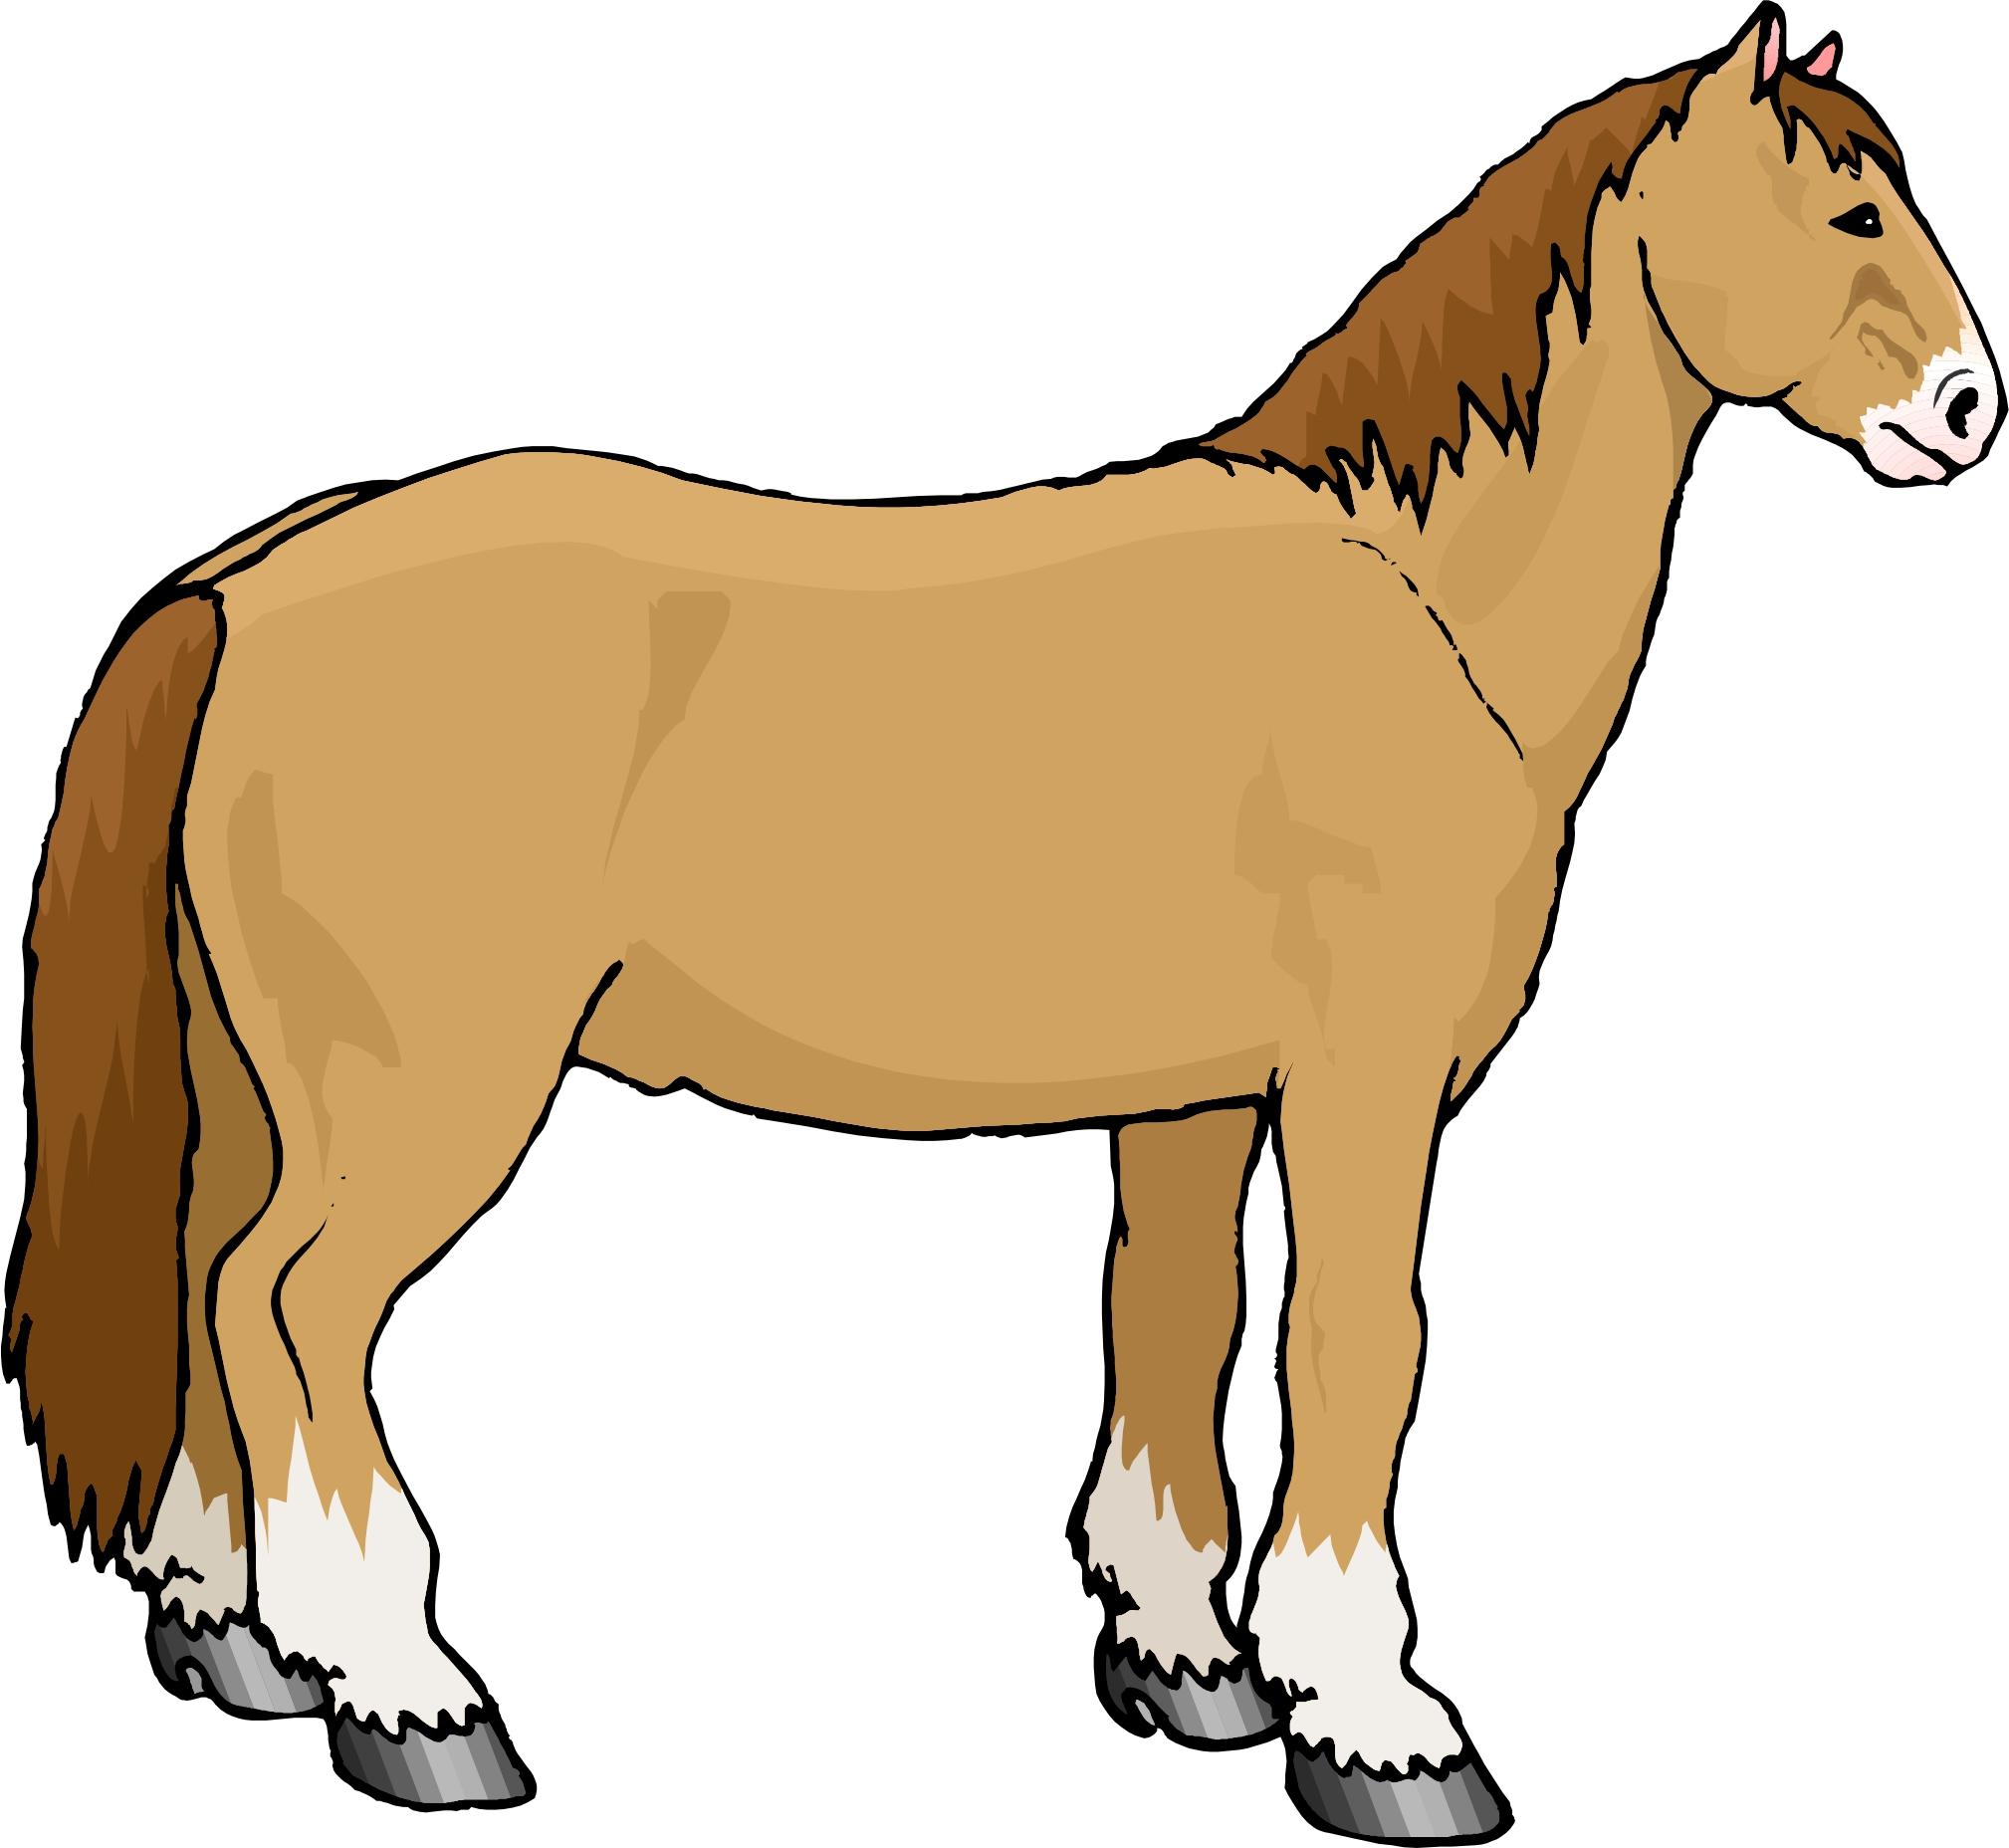 2018x1856 Cartoon Image Of Horse 101 Clip Art